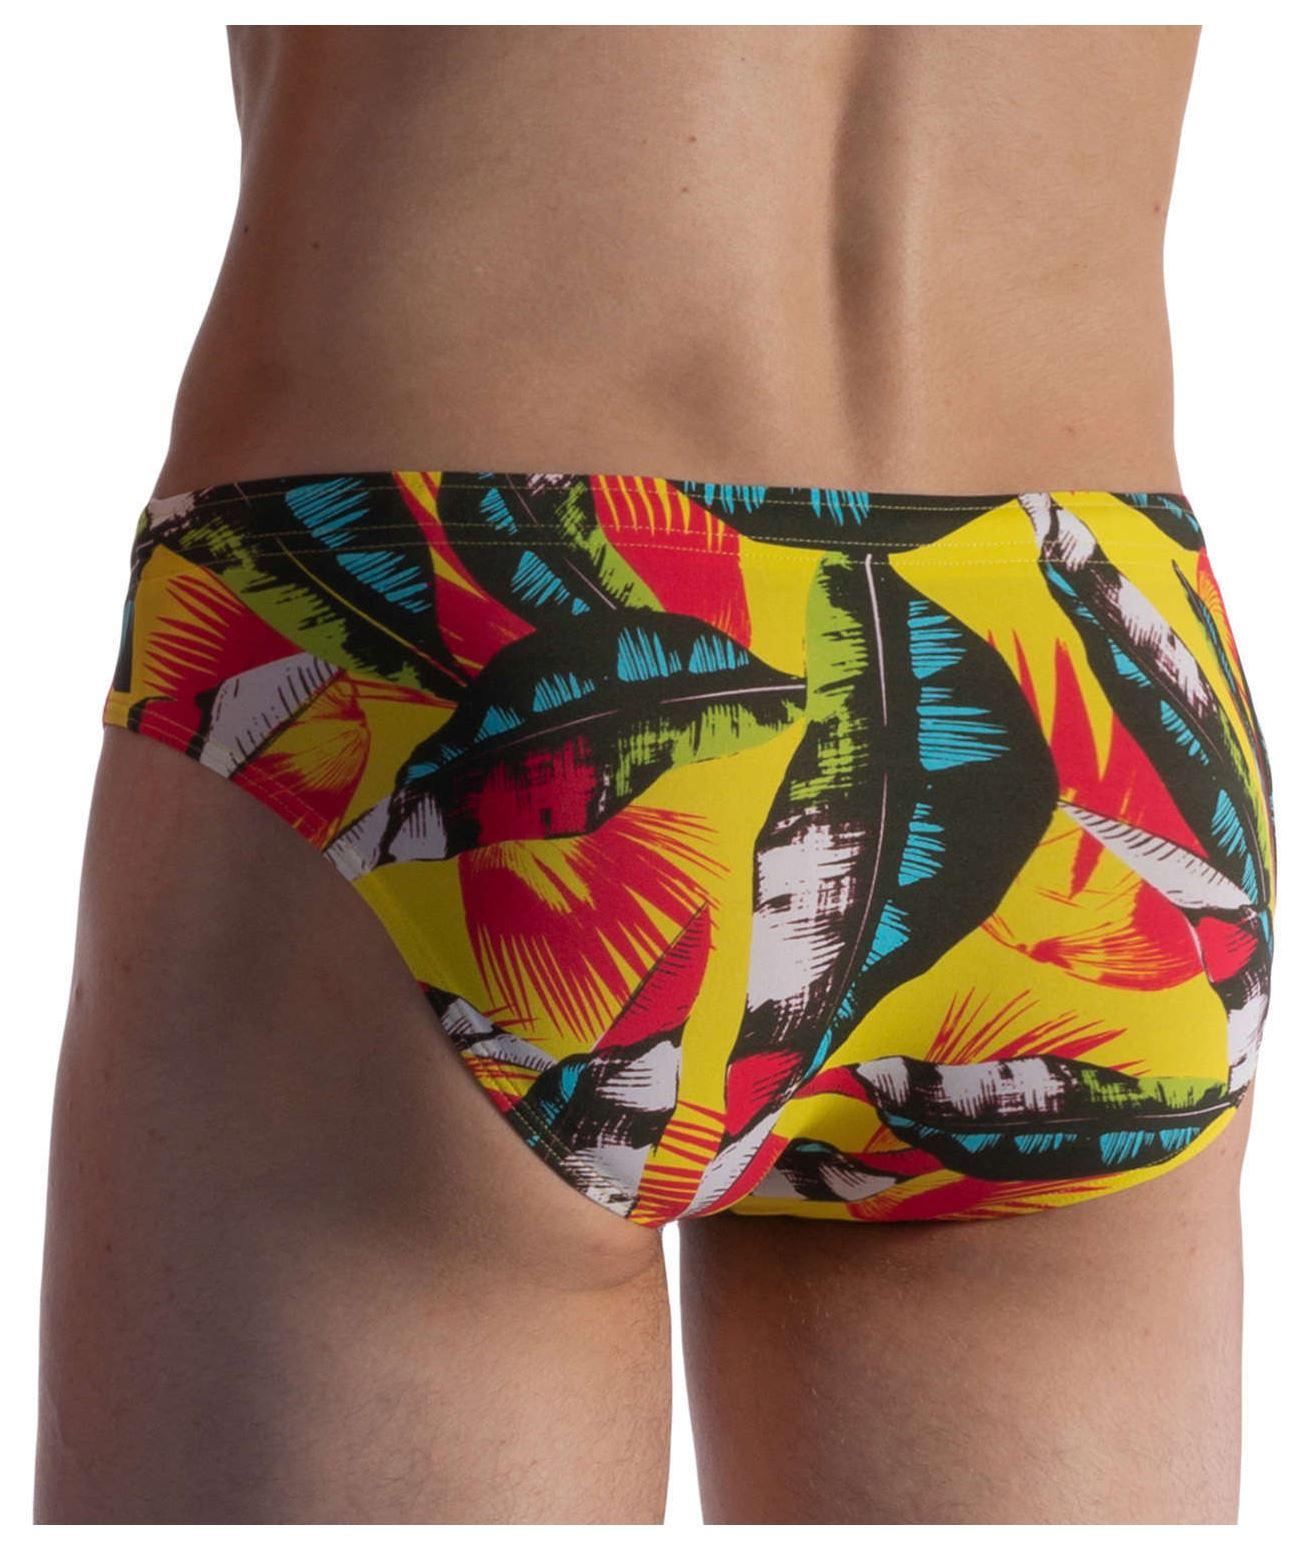 7cd67d81312e Detalles de Olaf Benz Blu 1853 Playa breve para hombre de Baño Bikini Macho  Slip Multicolor- ver título original